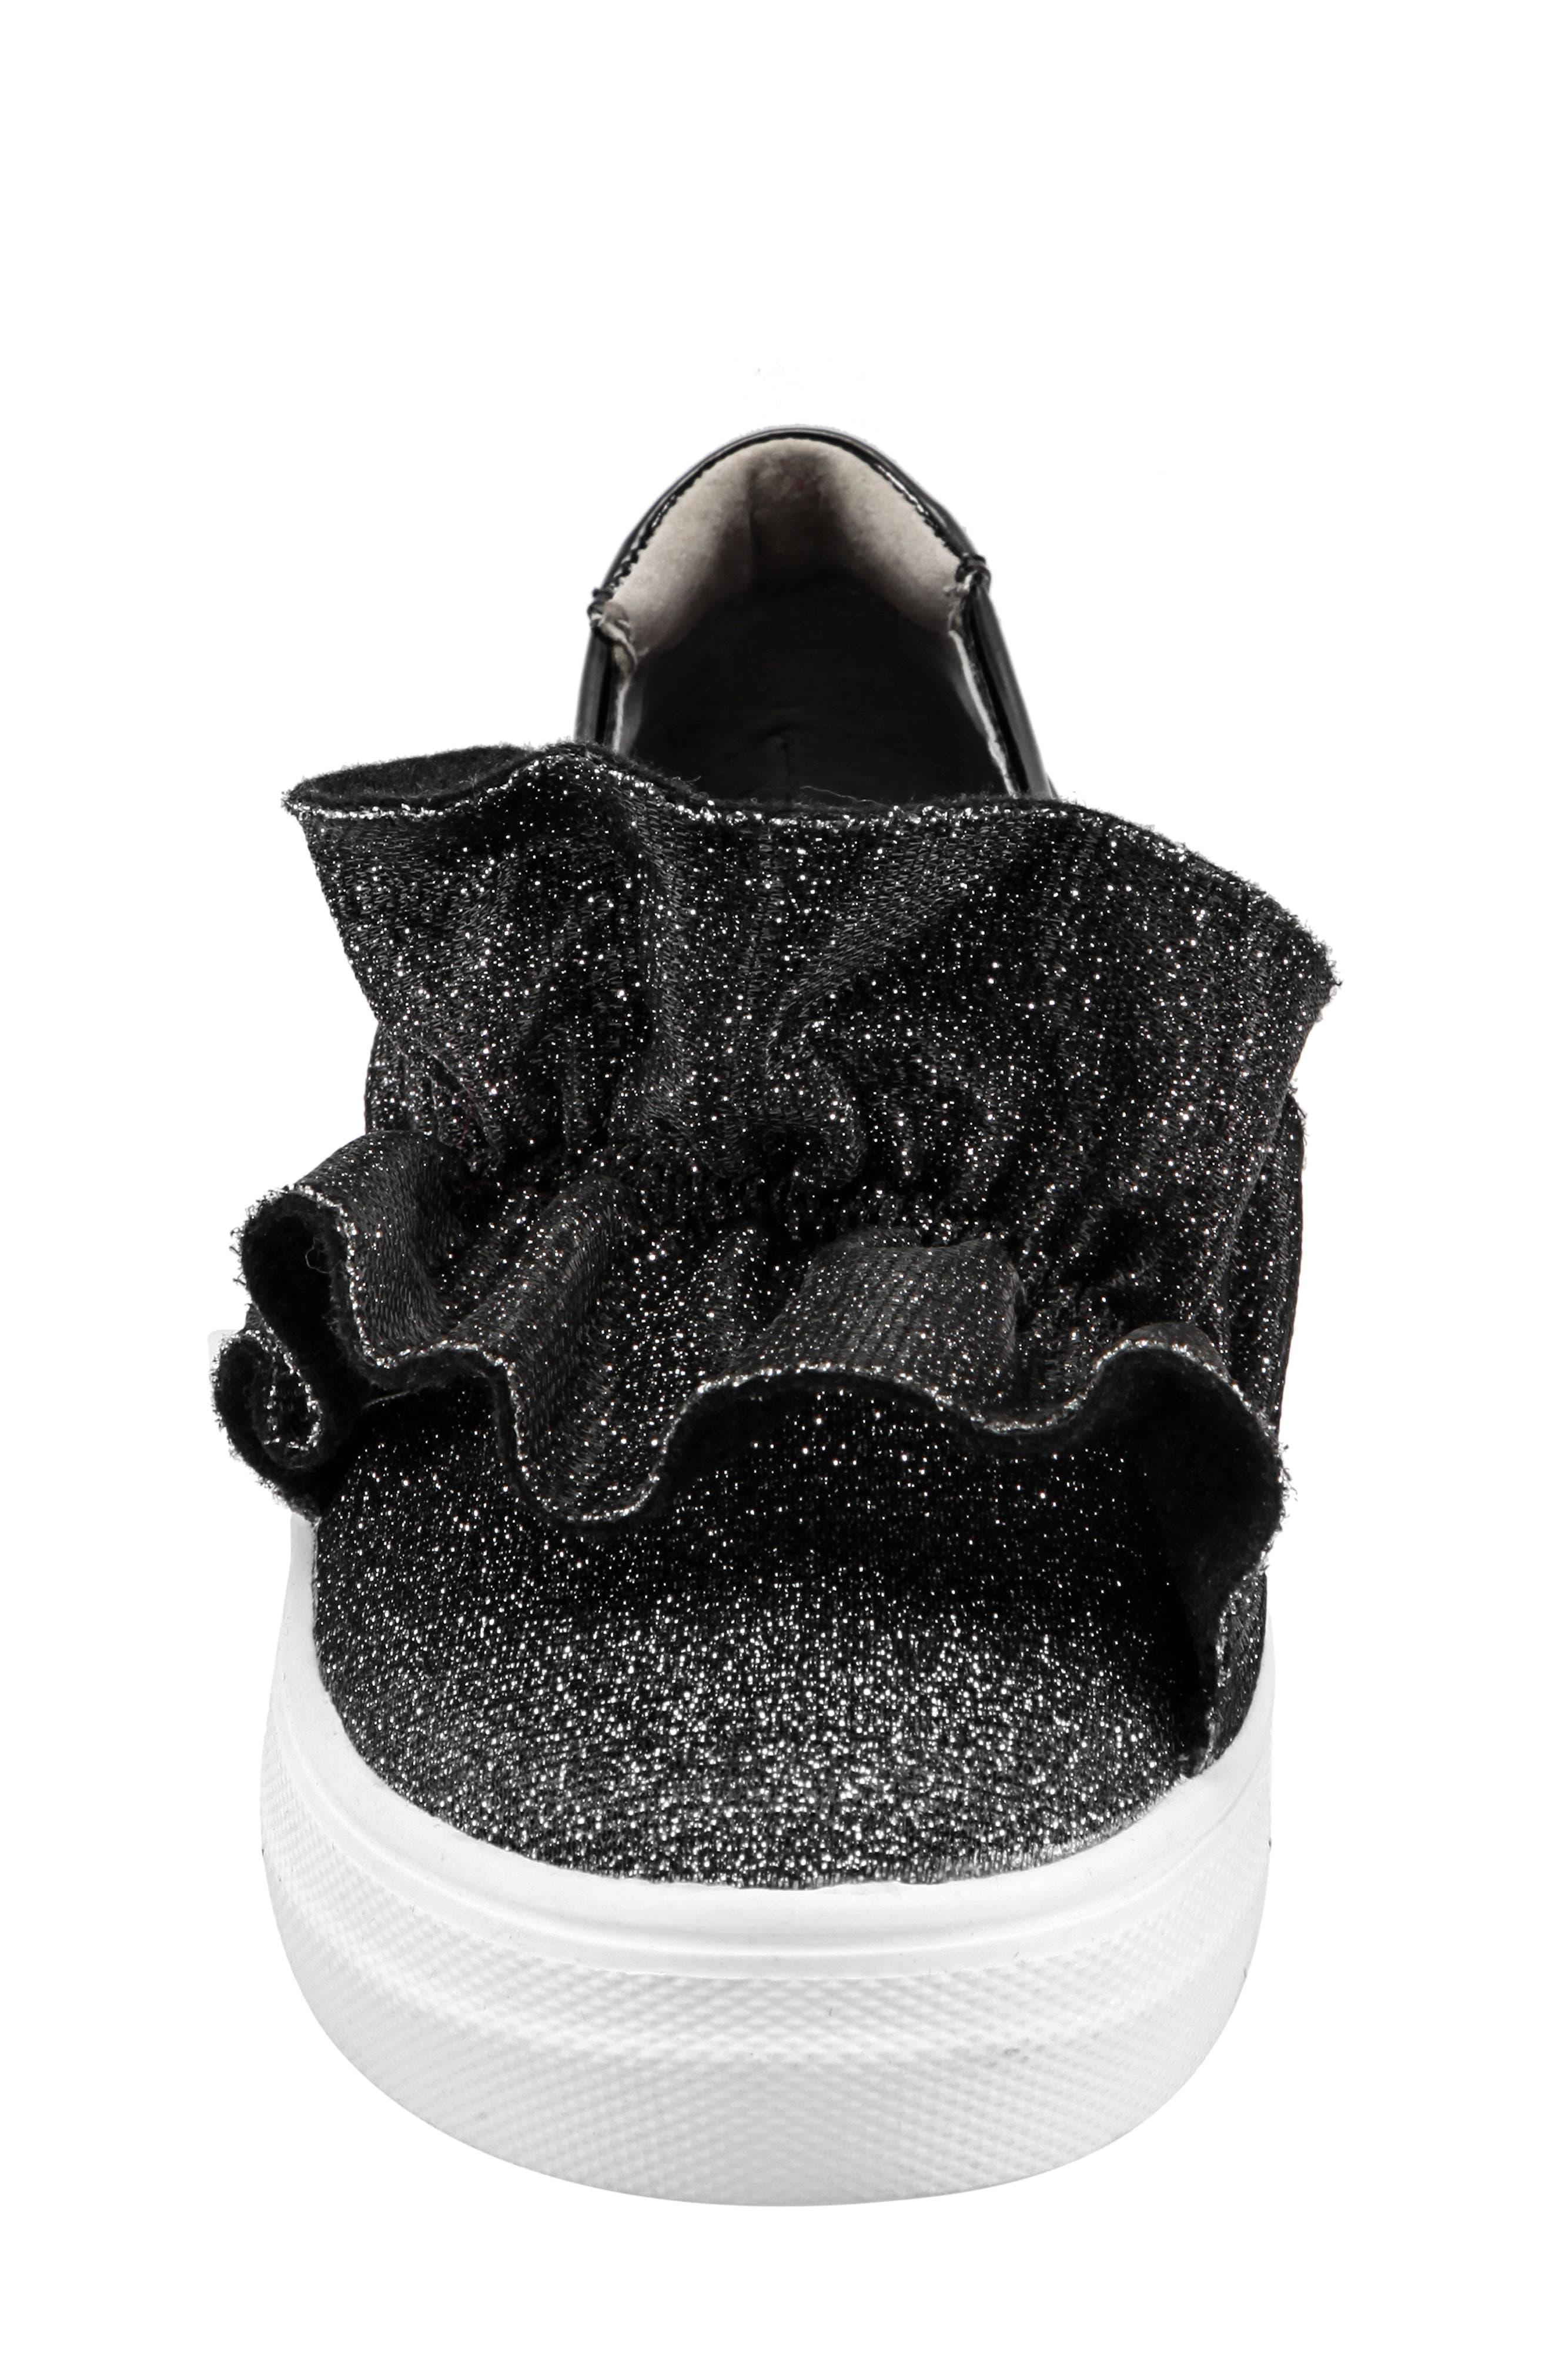 Ivani Slip-On Sneaker,                             Alternate thumbnail 4, color,                             BLACK SPARKLE FABRIC